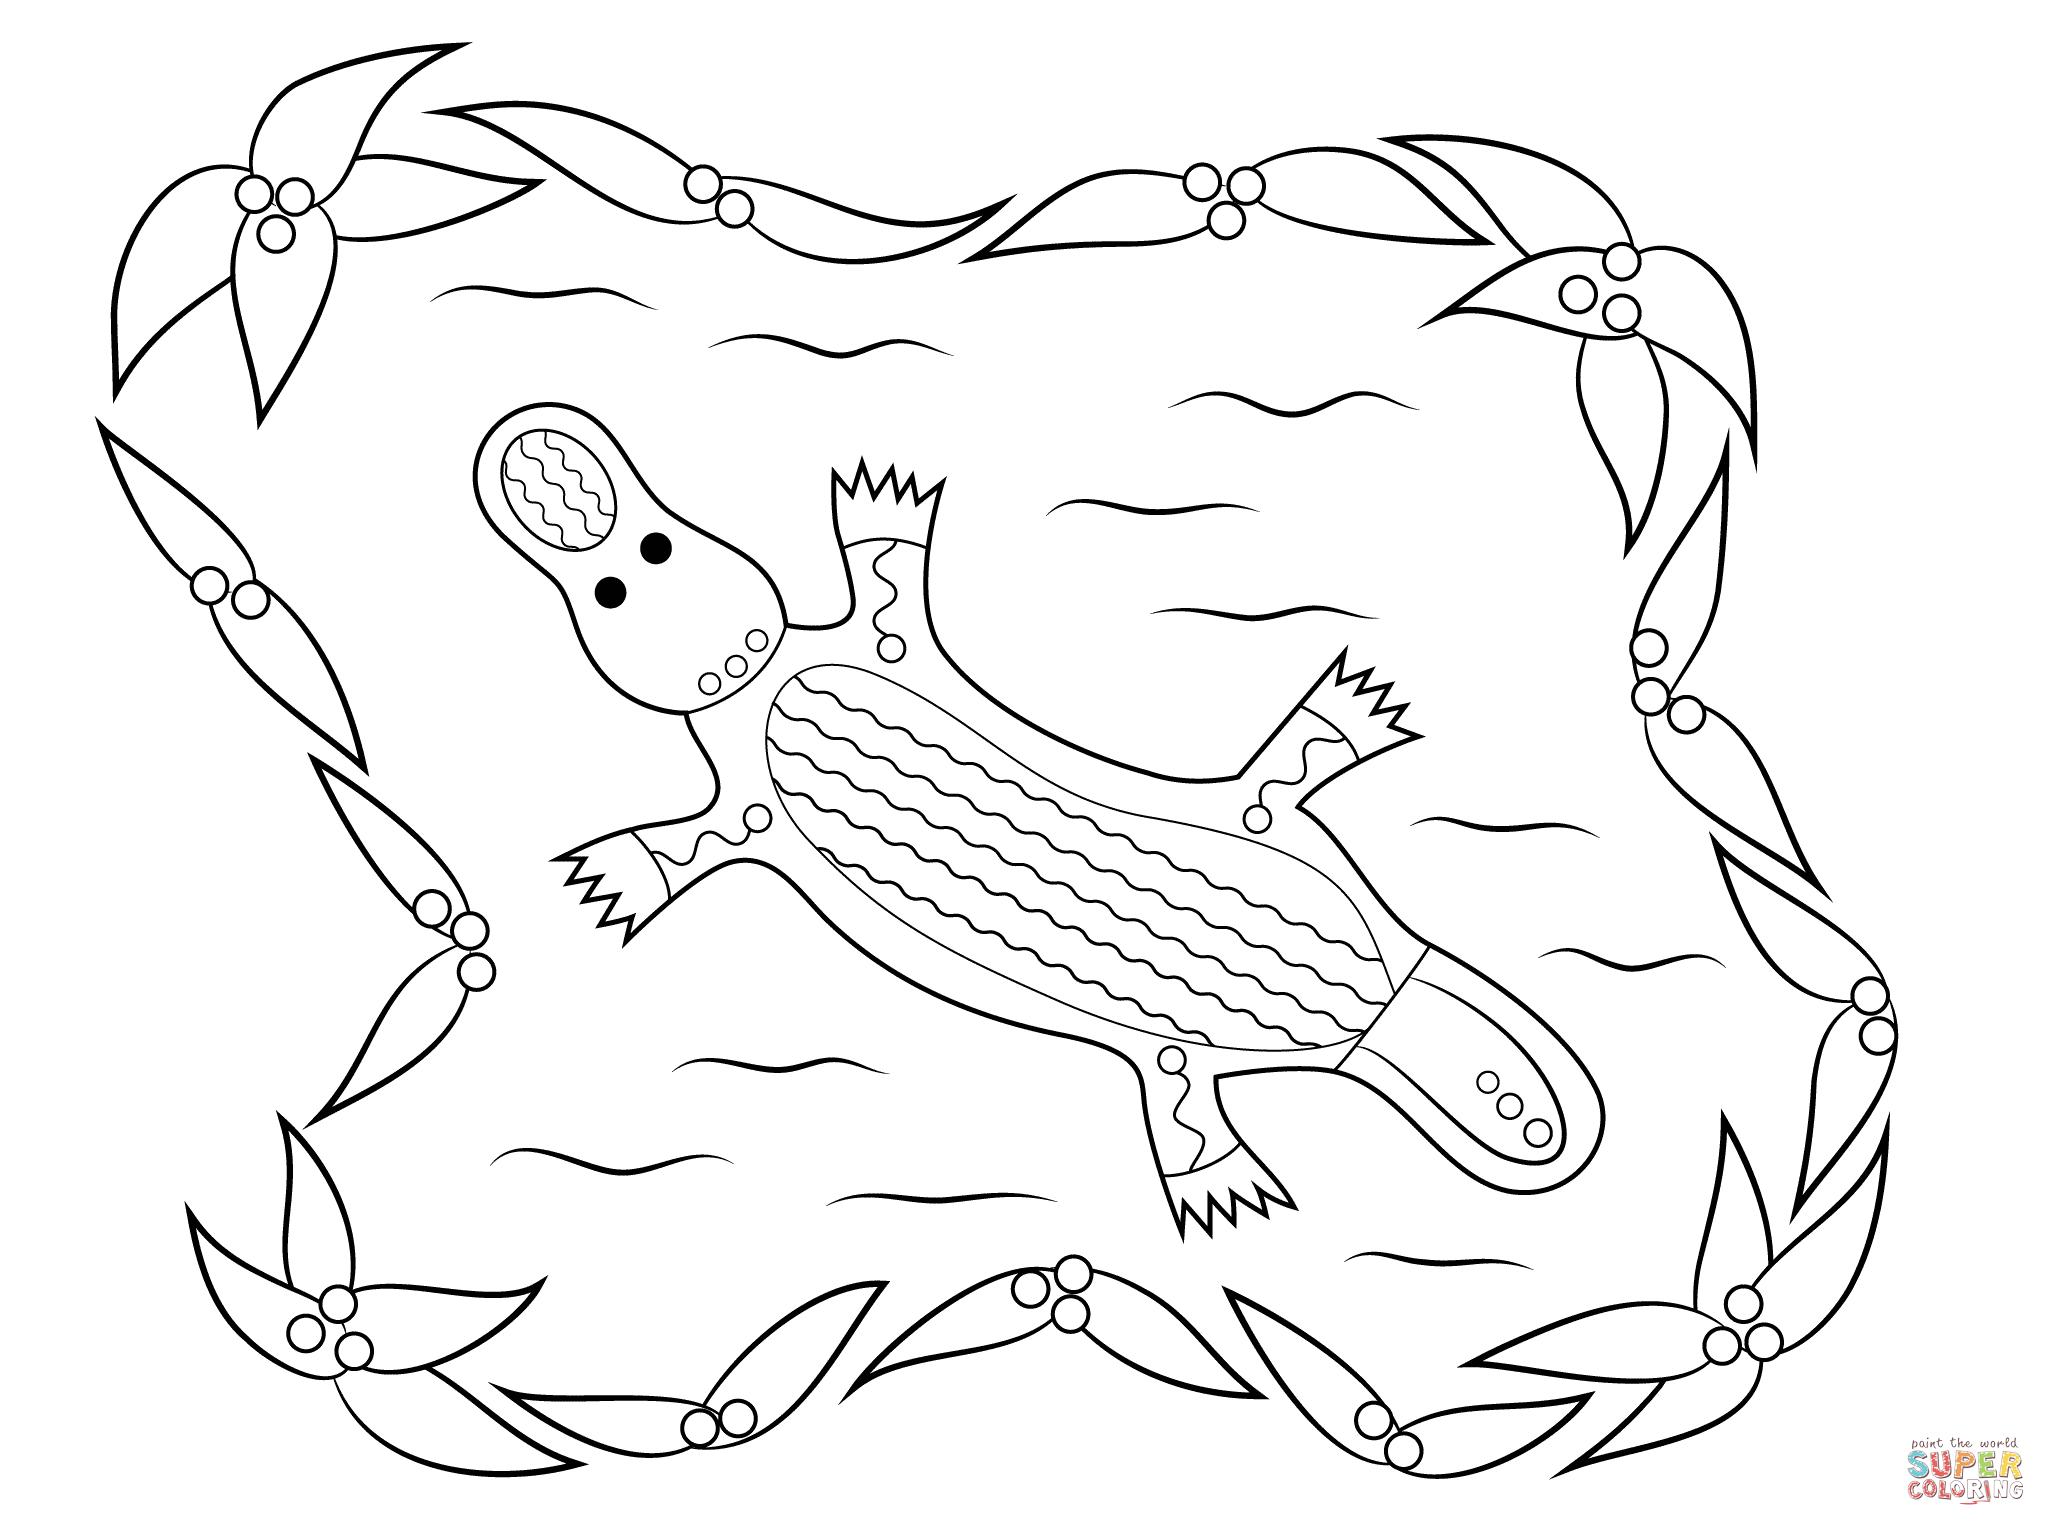 Platypus Aboriginal Art Aboriginal Dot Painting Aboriginal Art Aboriginal Art Animals